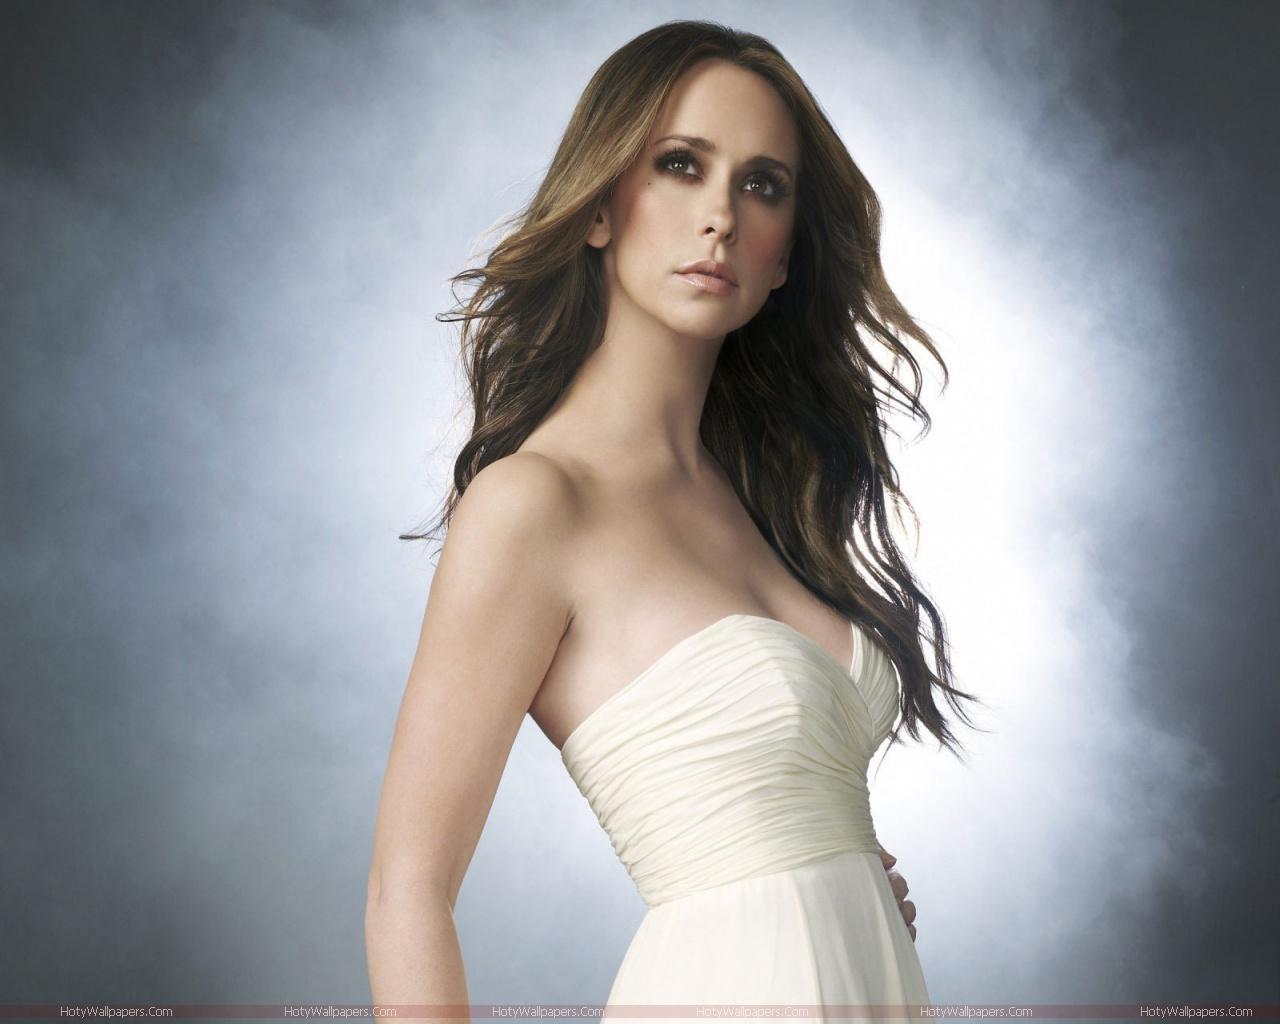 http://2.bp.blogspot.com/-bJwEMQb9zz4/TmjW-pKxZpI/AAAAAAAAKs0/8e7jBukStWw/s1600/Jennifer_Love_Hewitt_HD_Wallpaper.jpg